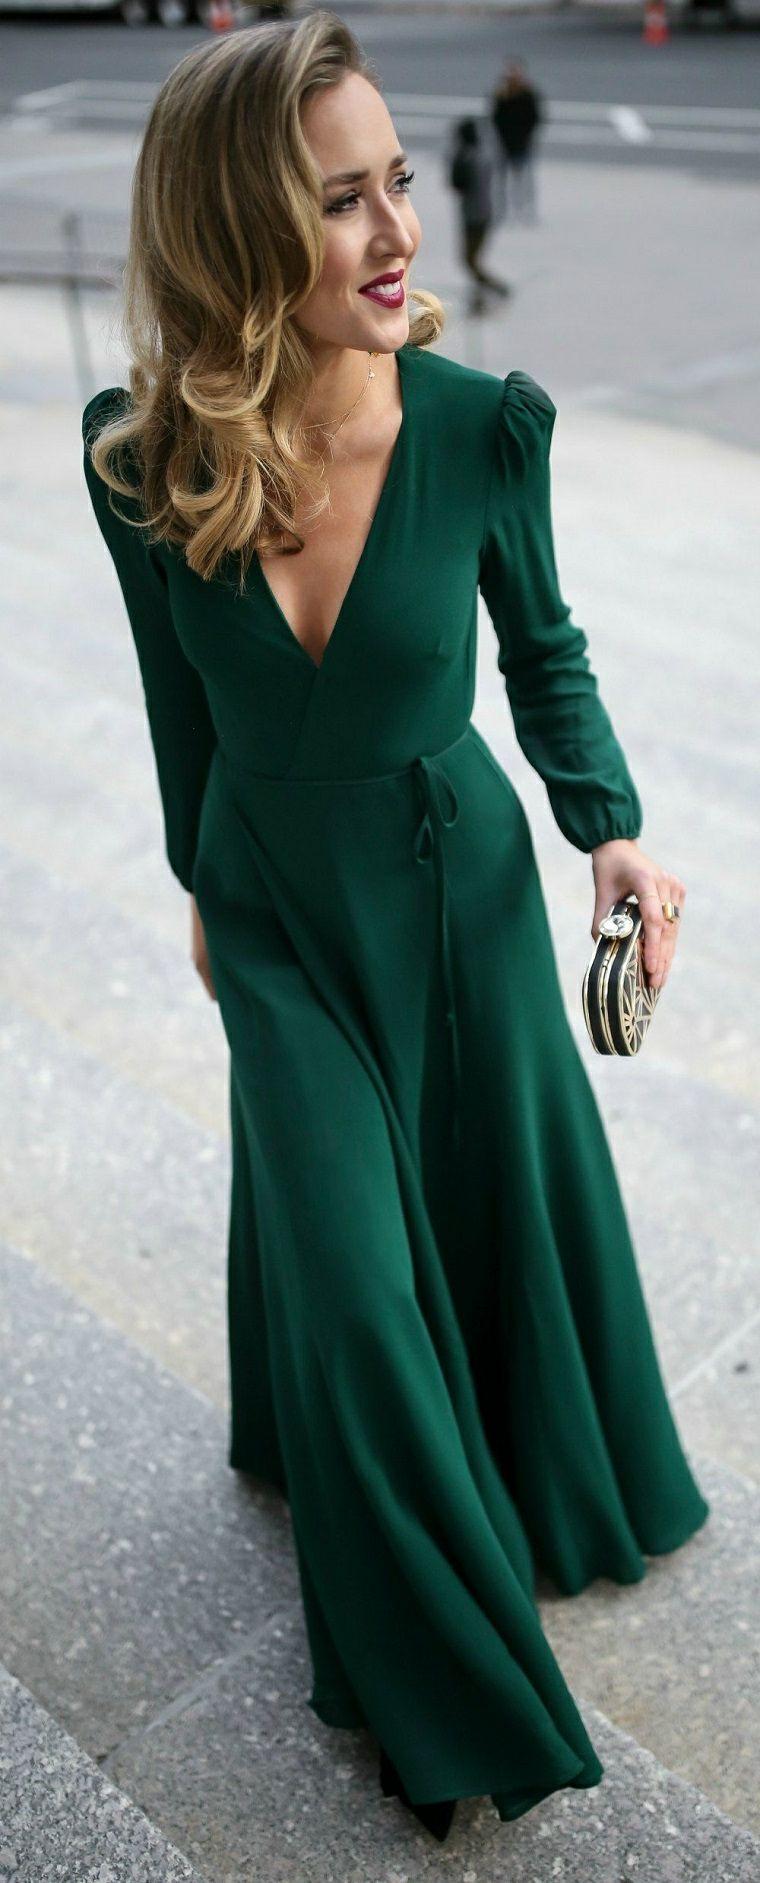 Vestiti Verdi Eleganti.1001 Idee Per Abiti Da Cerimonia Lunghi Ed Eleganti Abiti